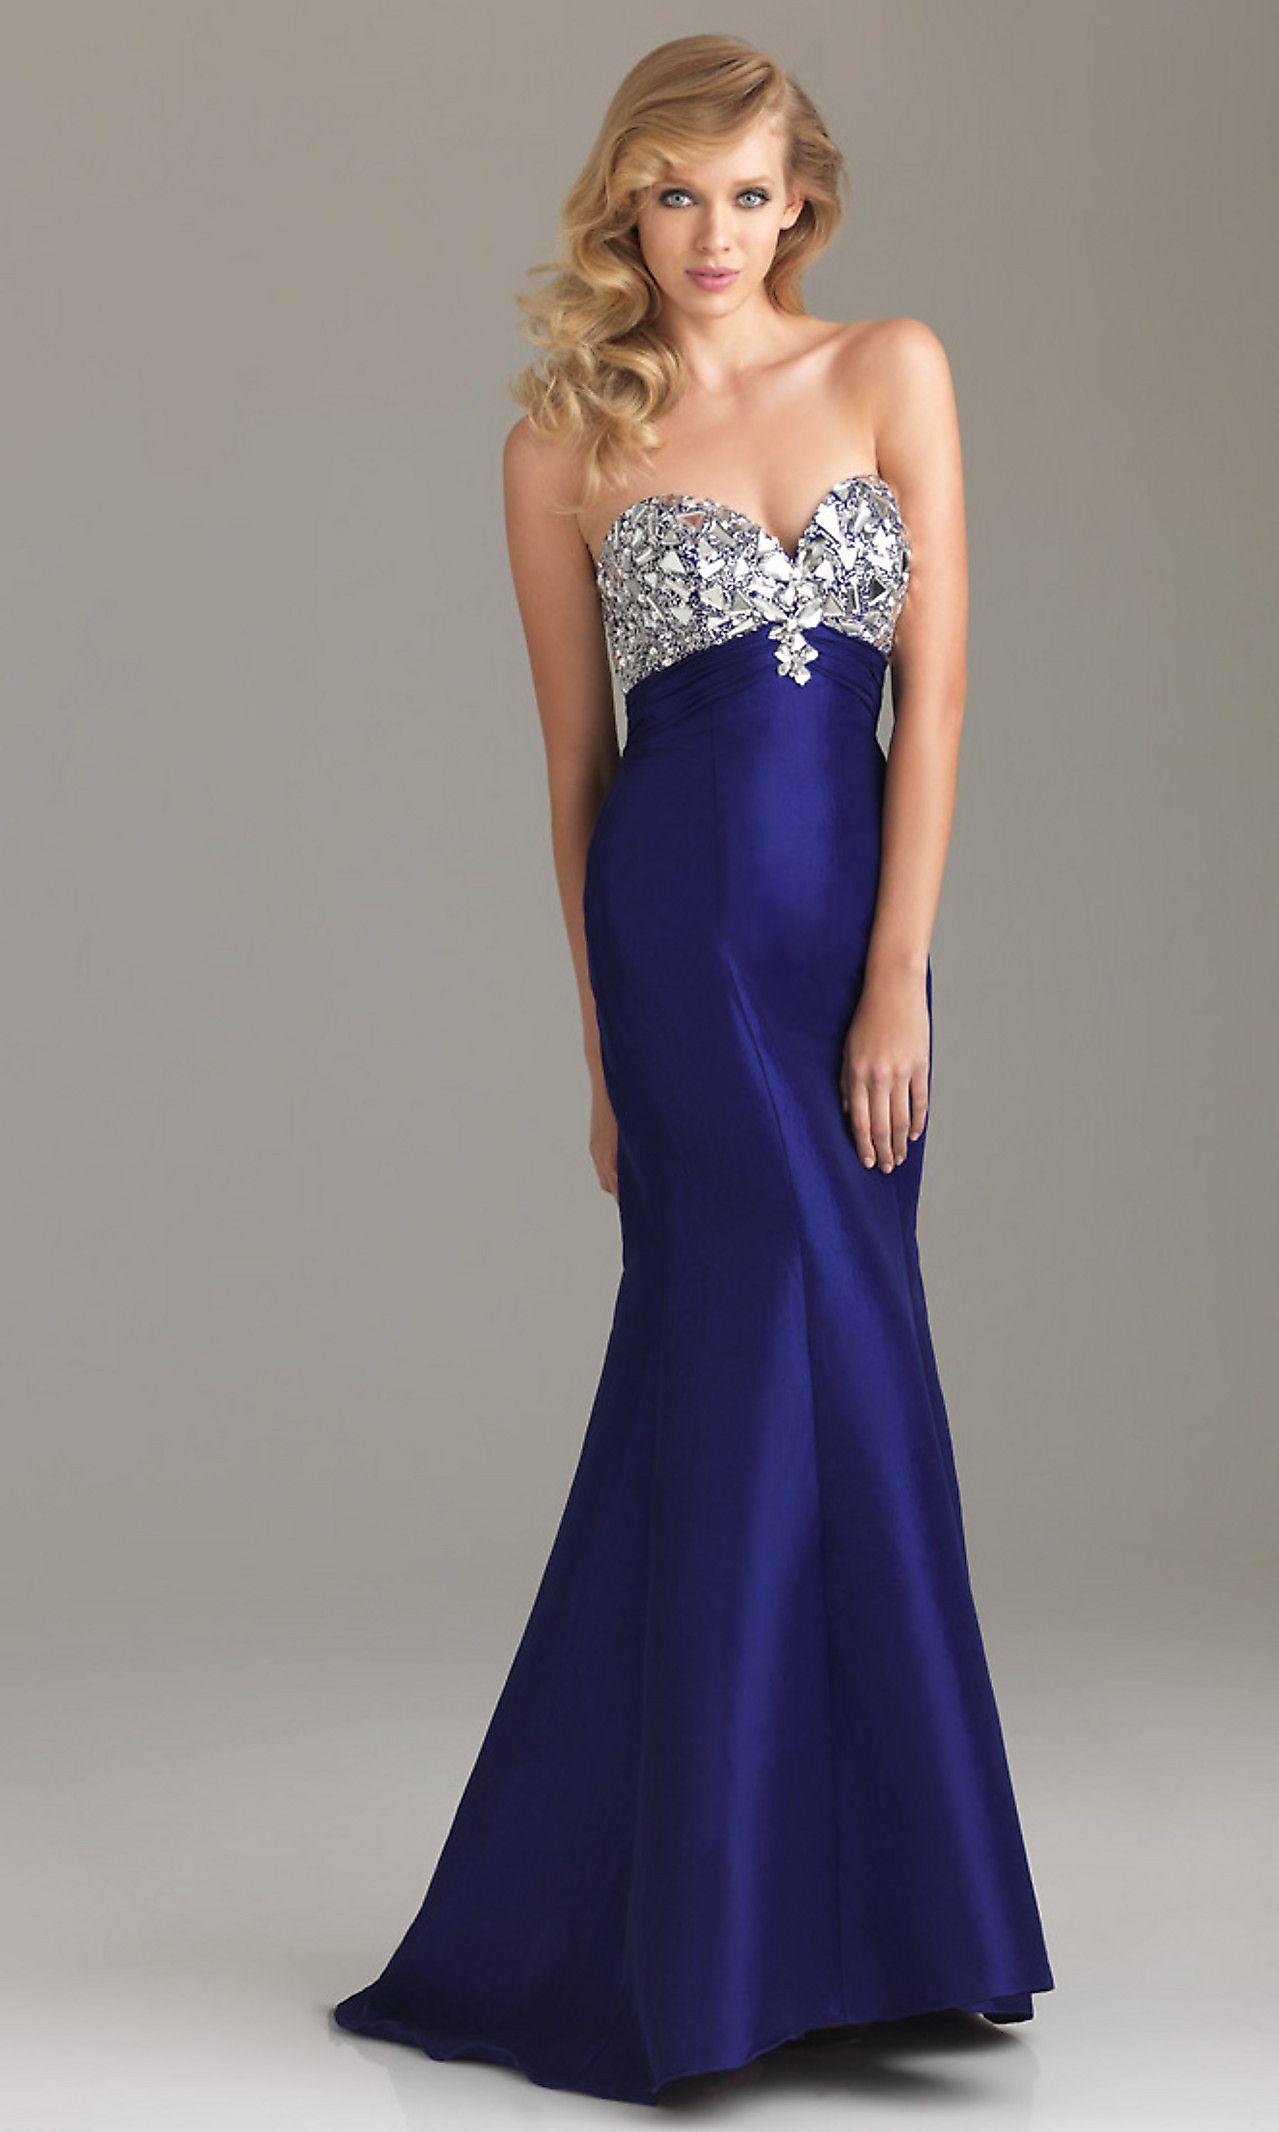 dresses for prom - Google Search | prom dresses | Pinterest ...